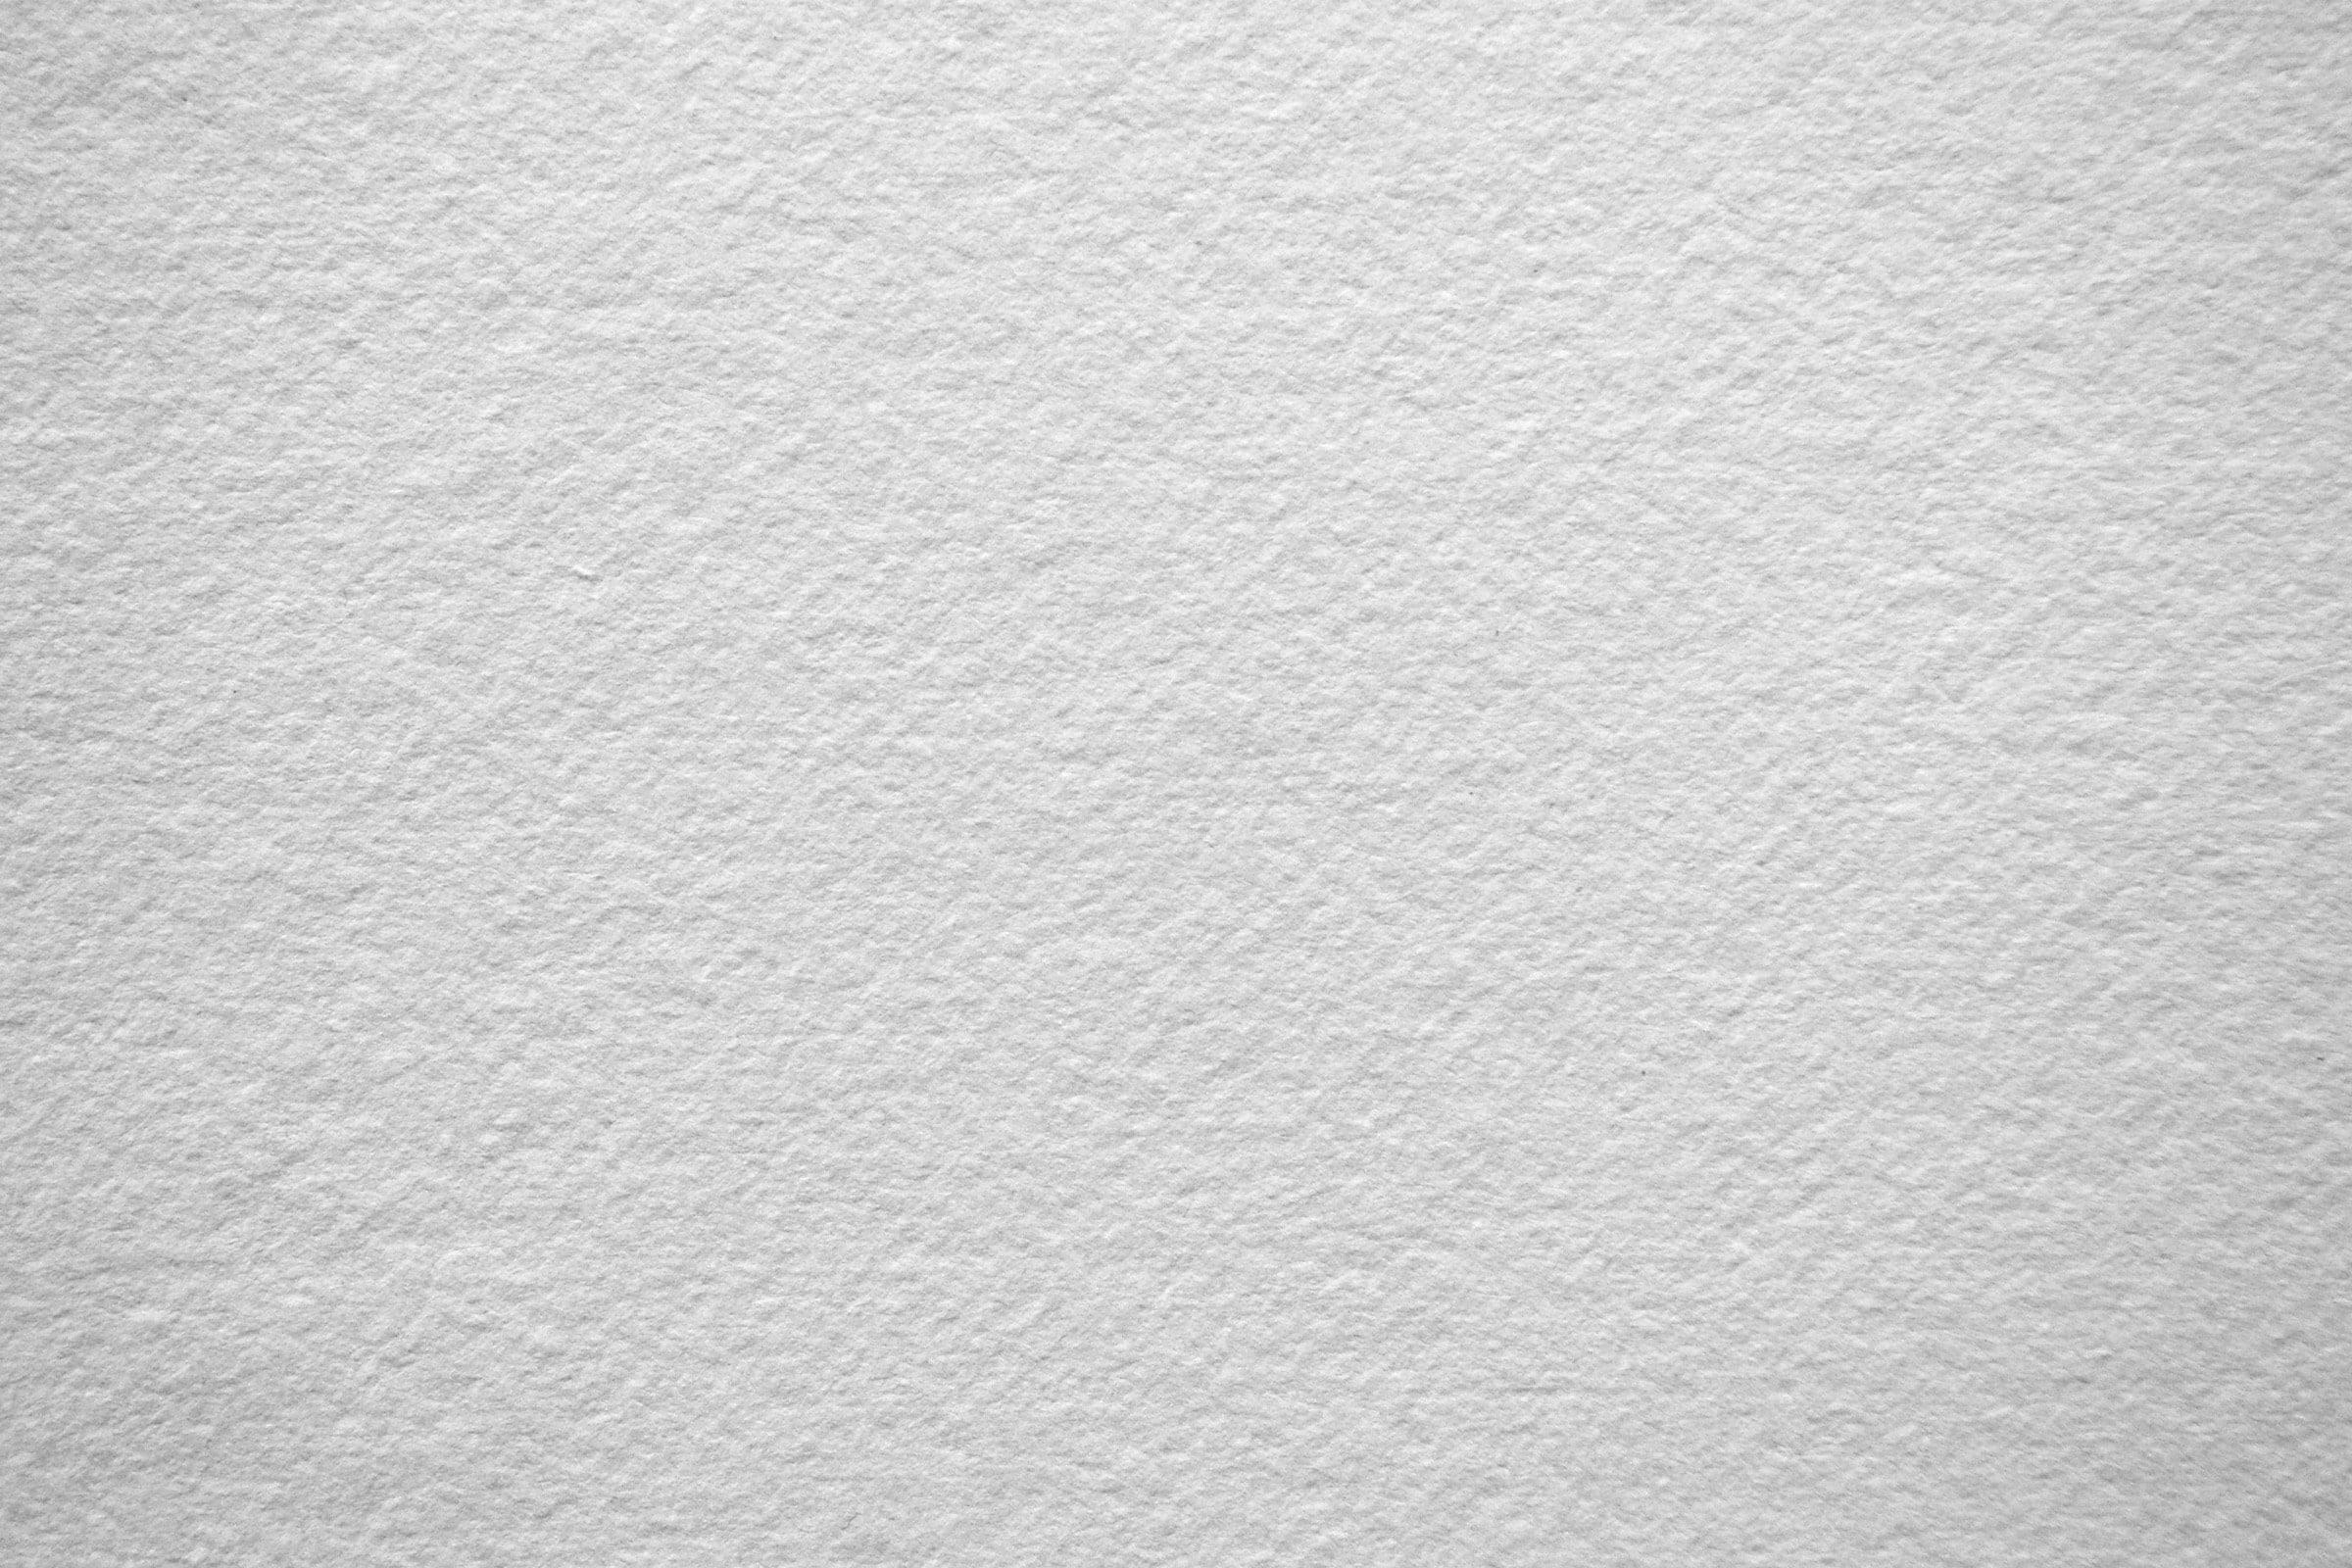 Khadi Artist Paper White Rag 22 Quot X 30 Quot 3 Sheets